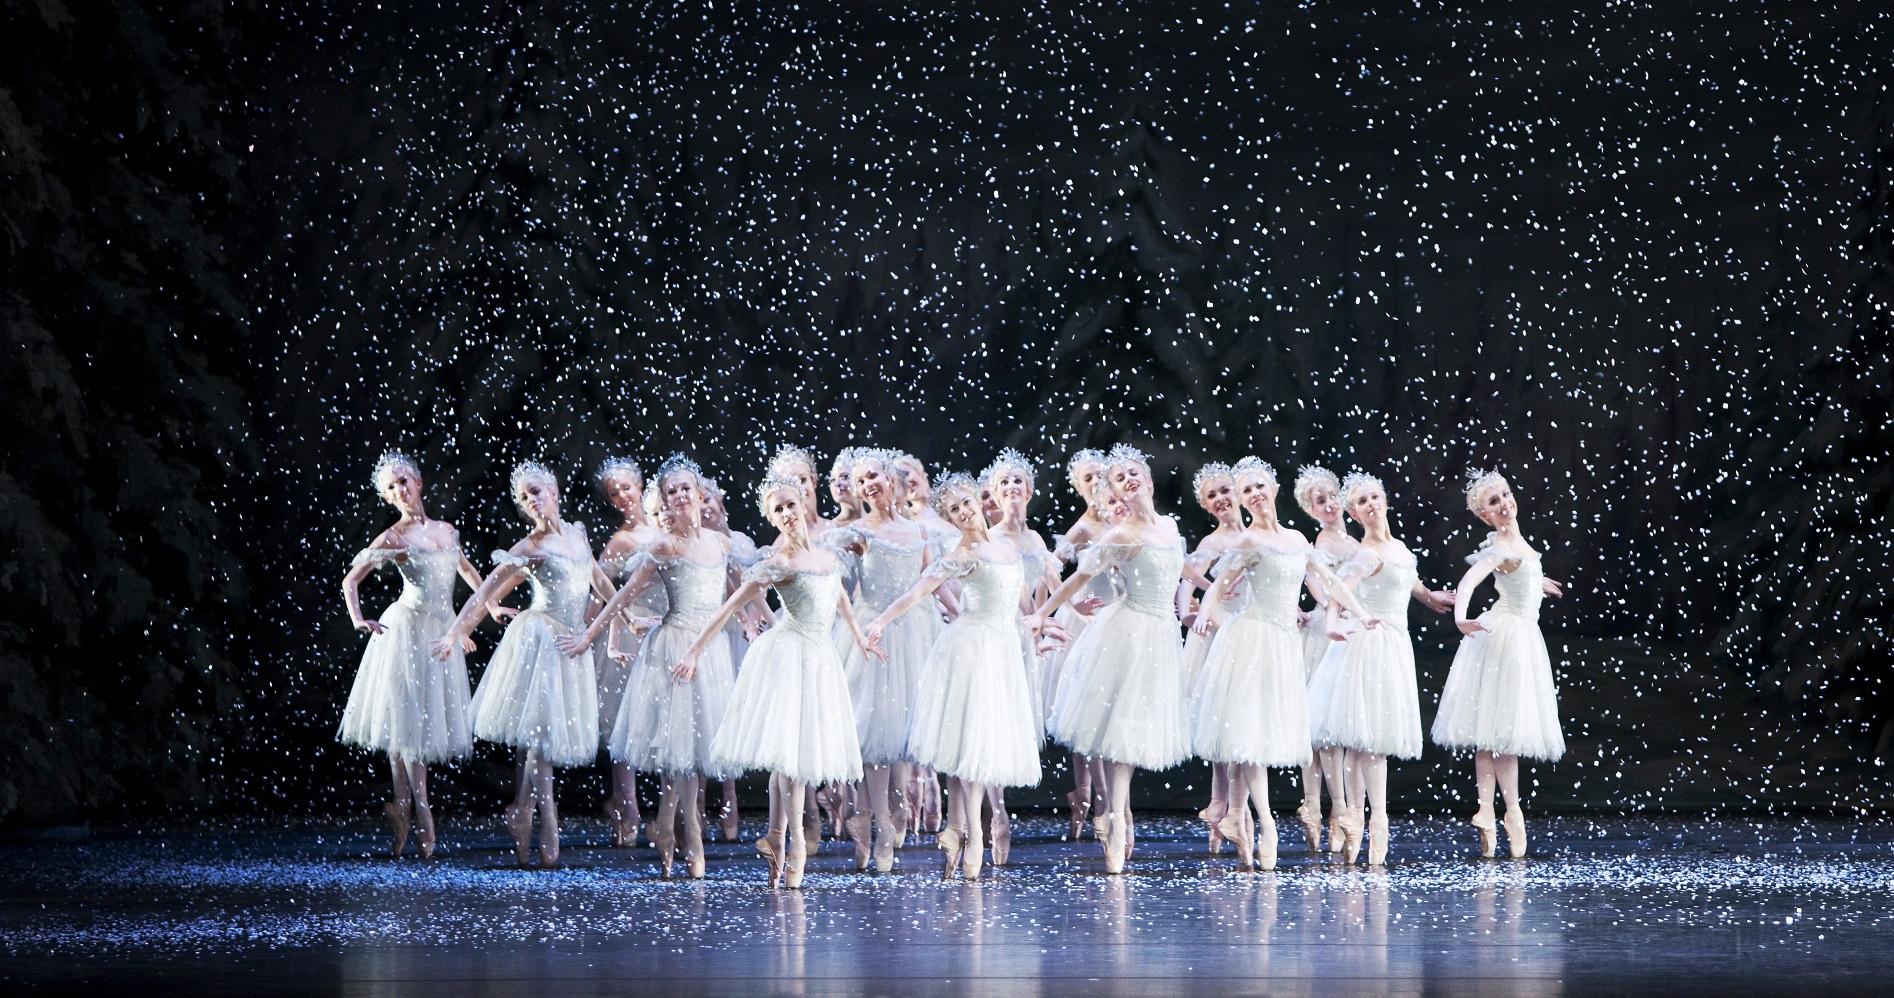 The-Nutcracker-Royal-Ballet.jpg